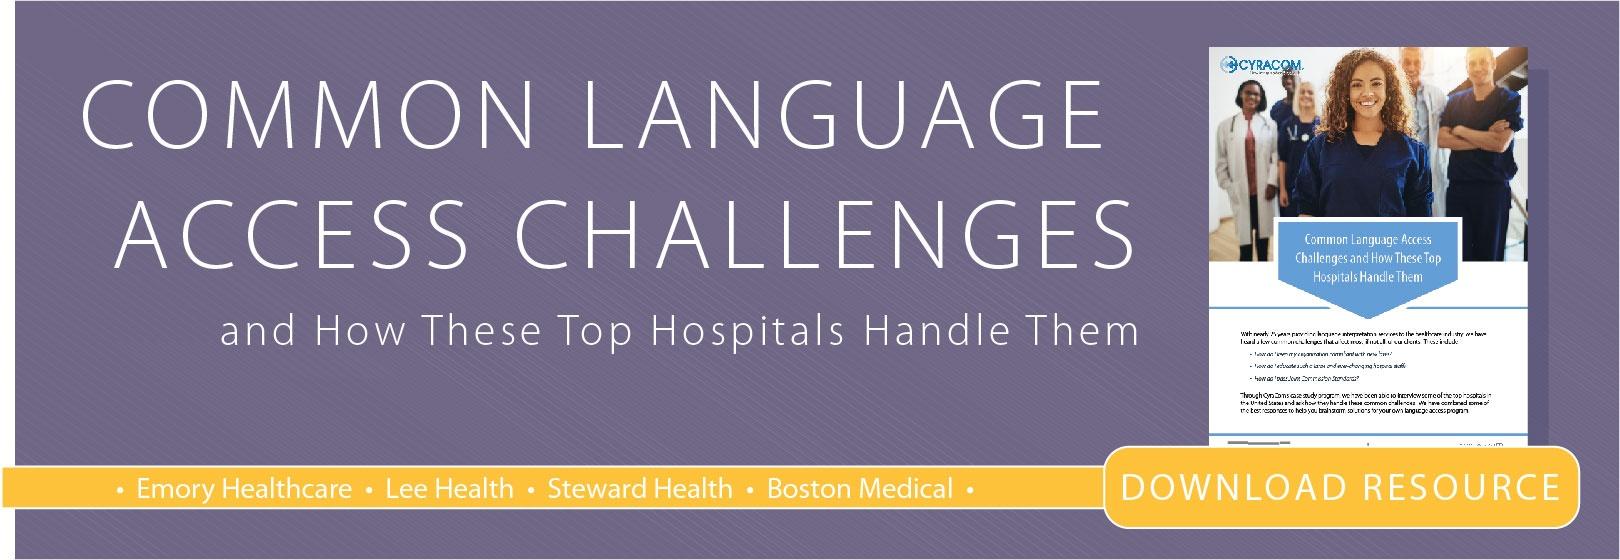 Common Language Access Challenges Case Study Download